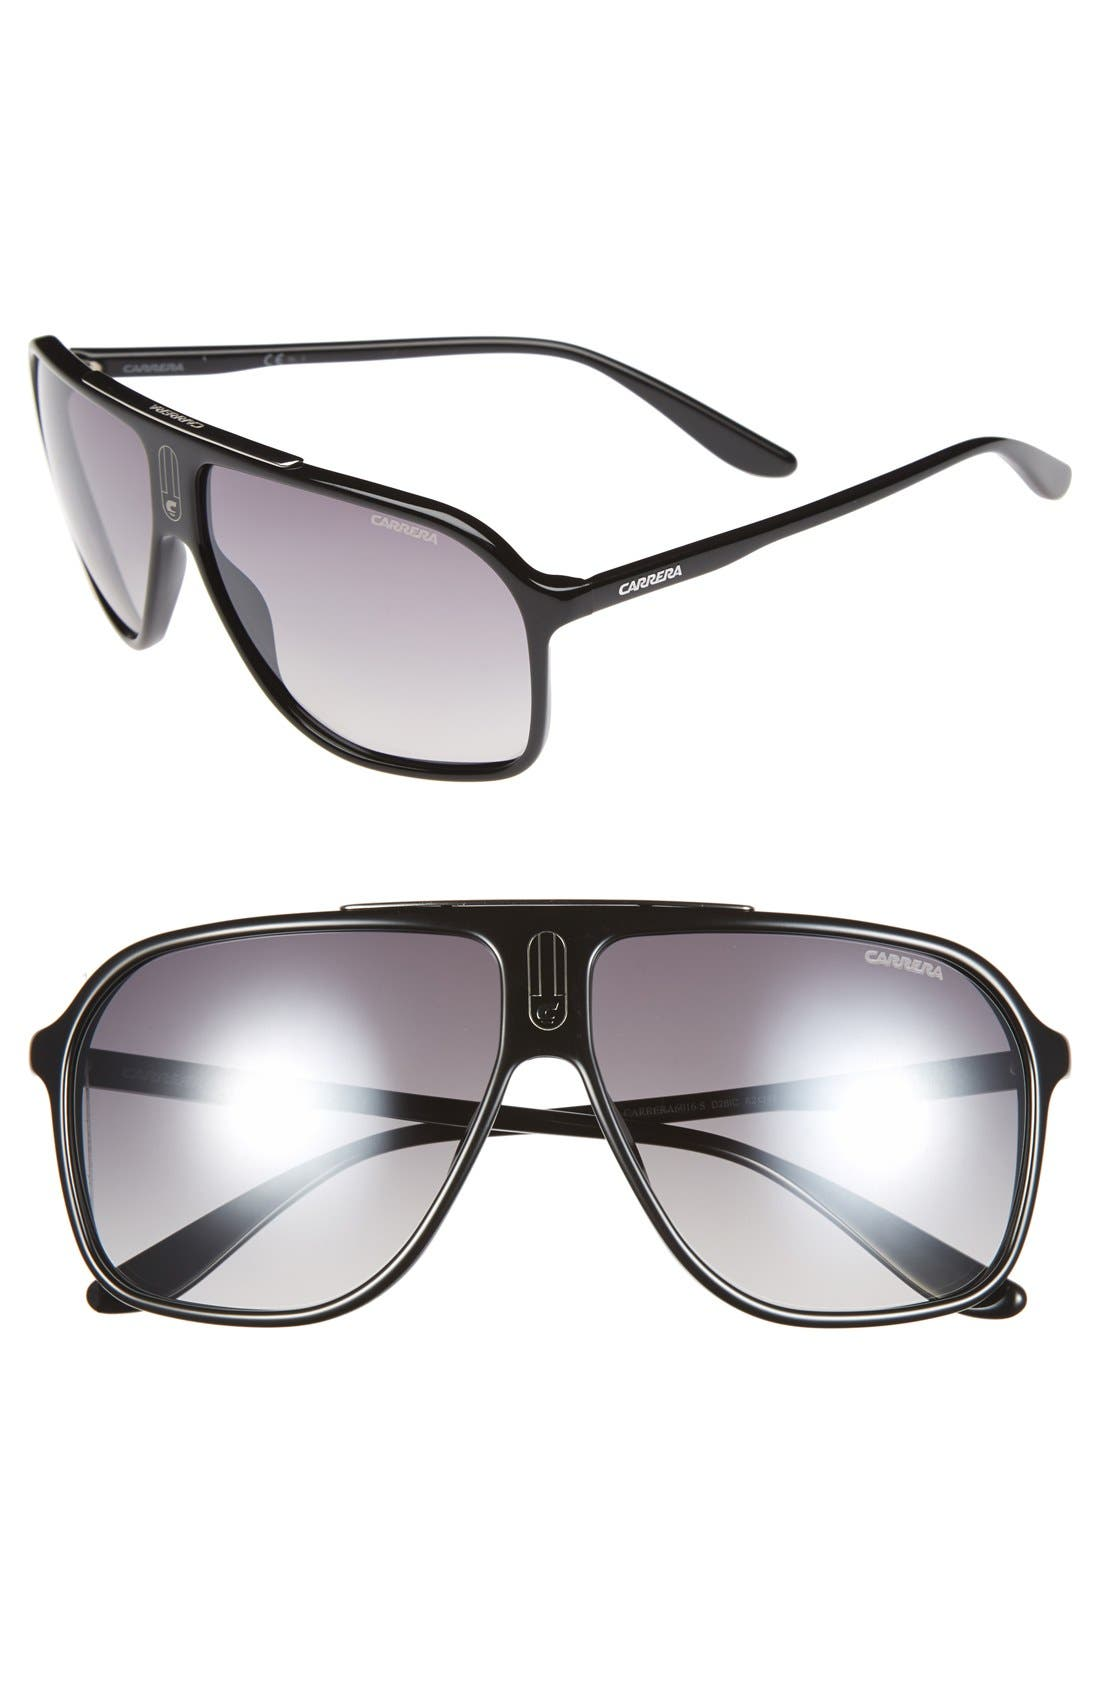 62mm Sunglasses,                         Main,                         color, 001